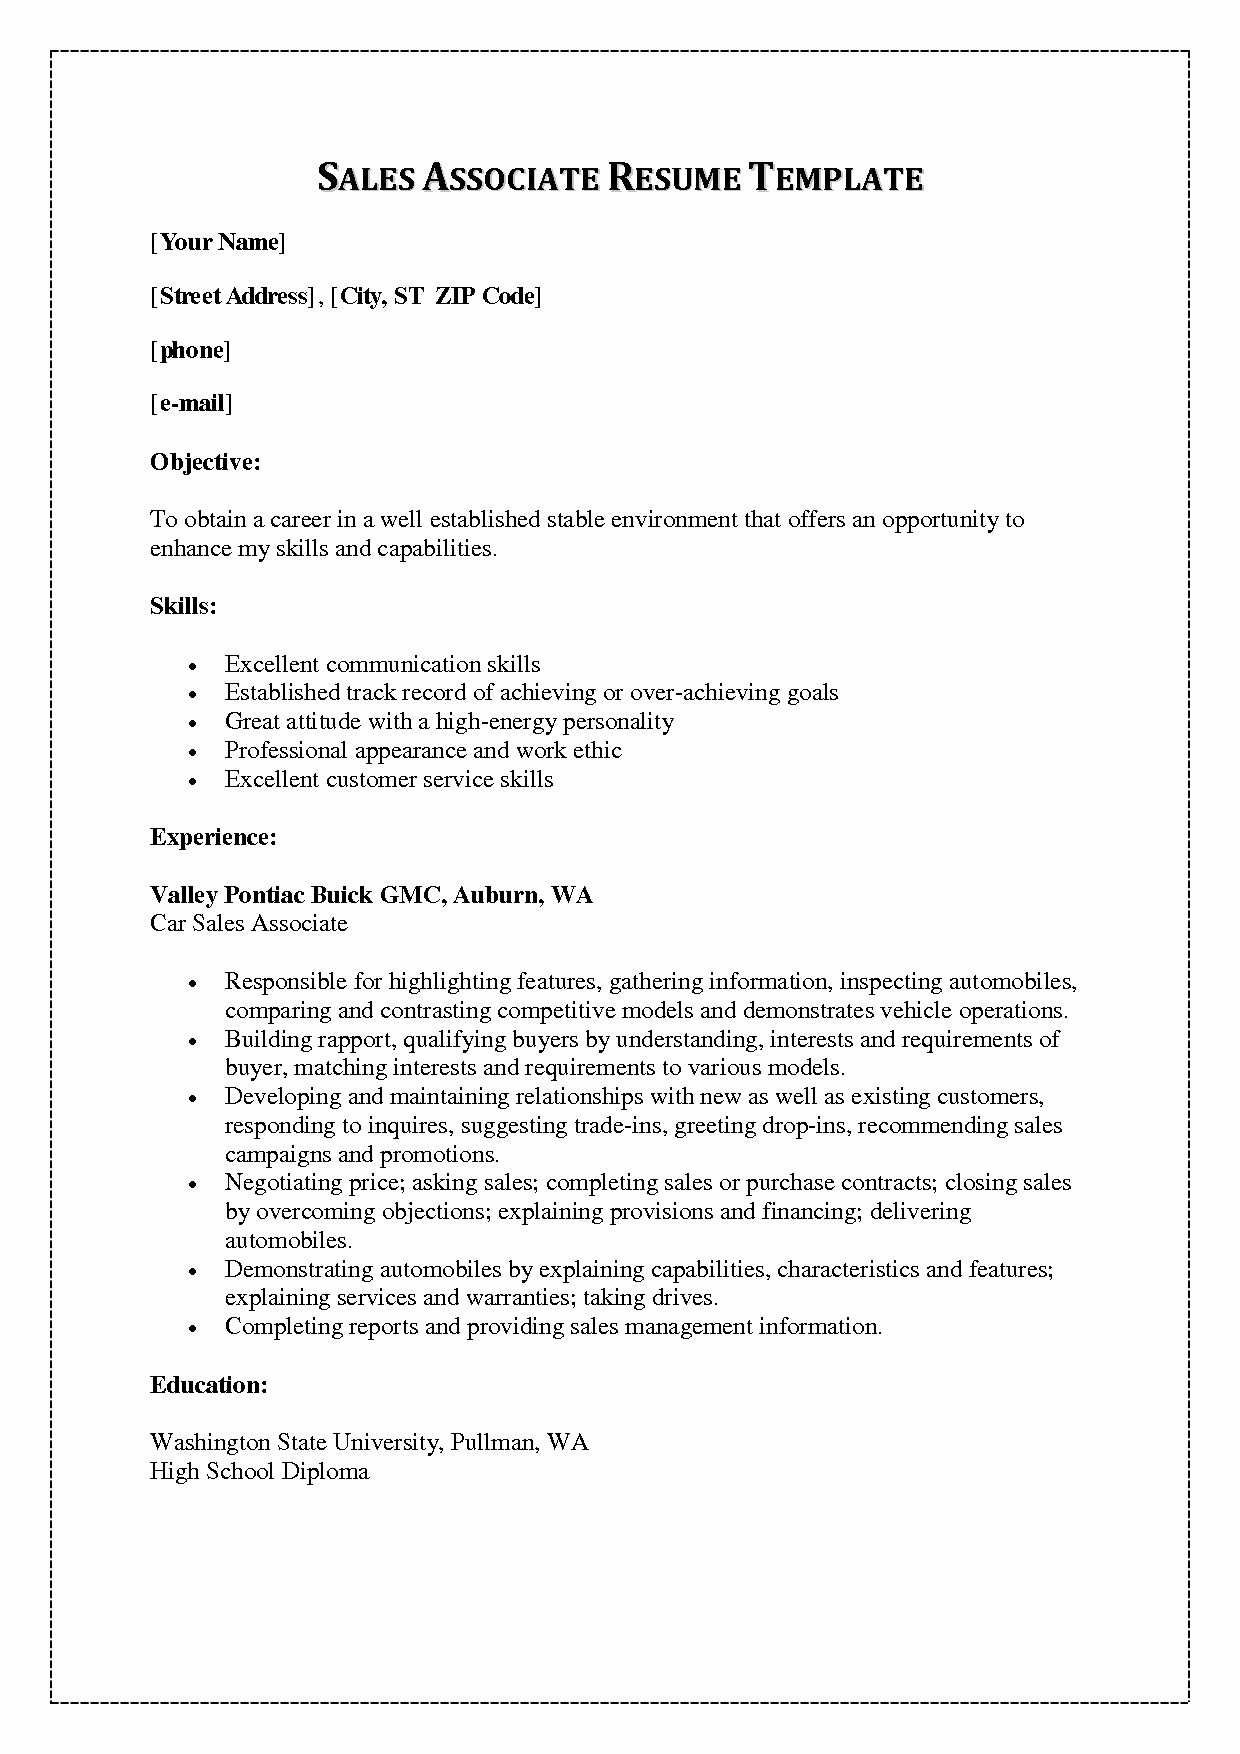 Sales Resume Template Microsoft Word Luxury Resume and Template Phenomenal Executive Resume Template